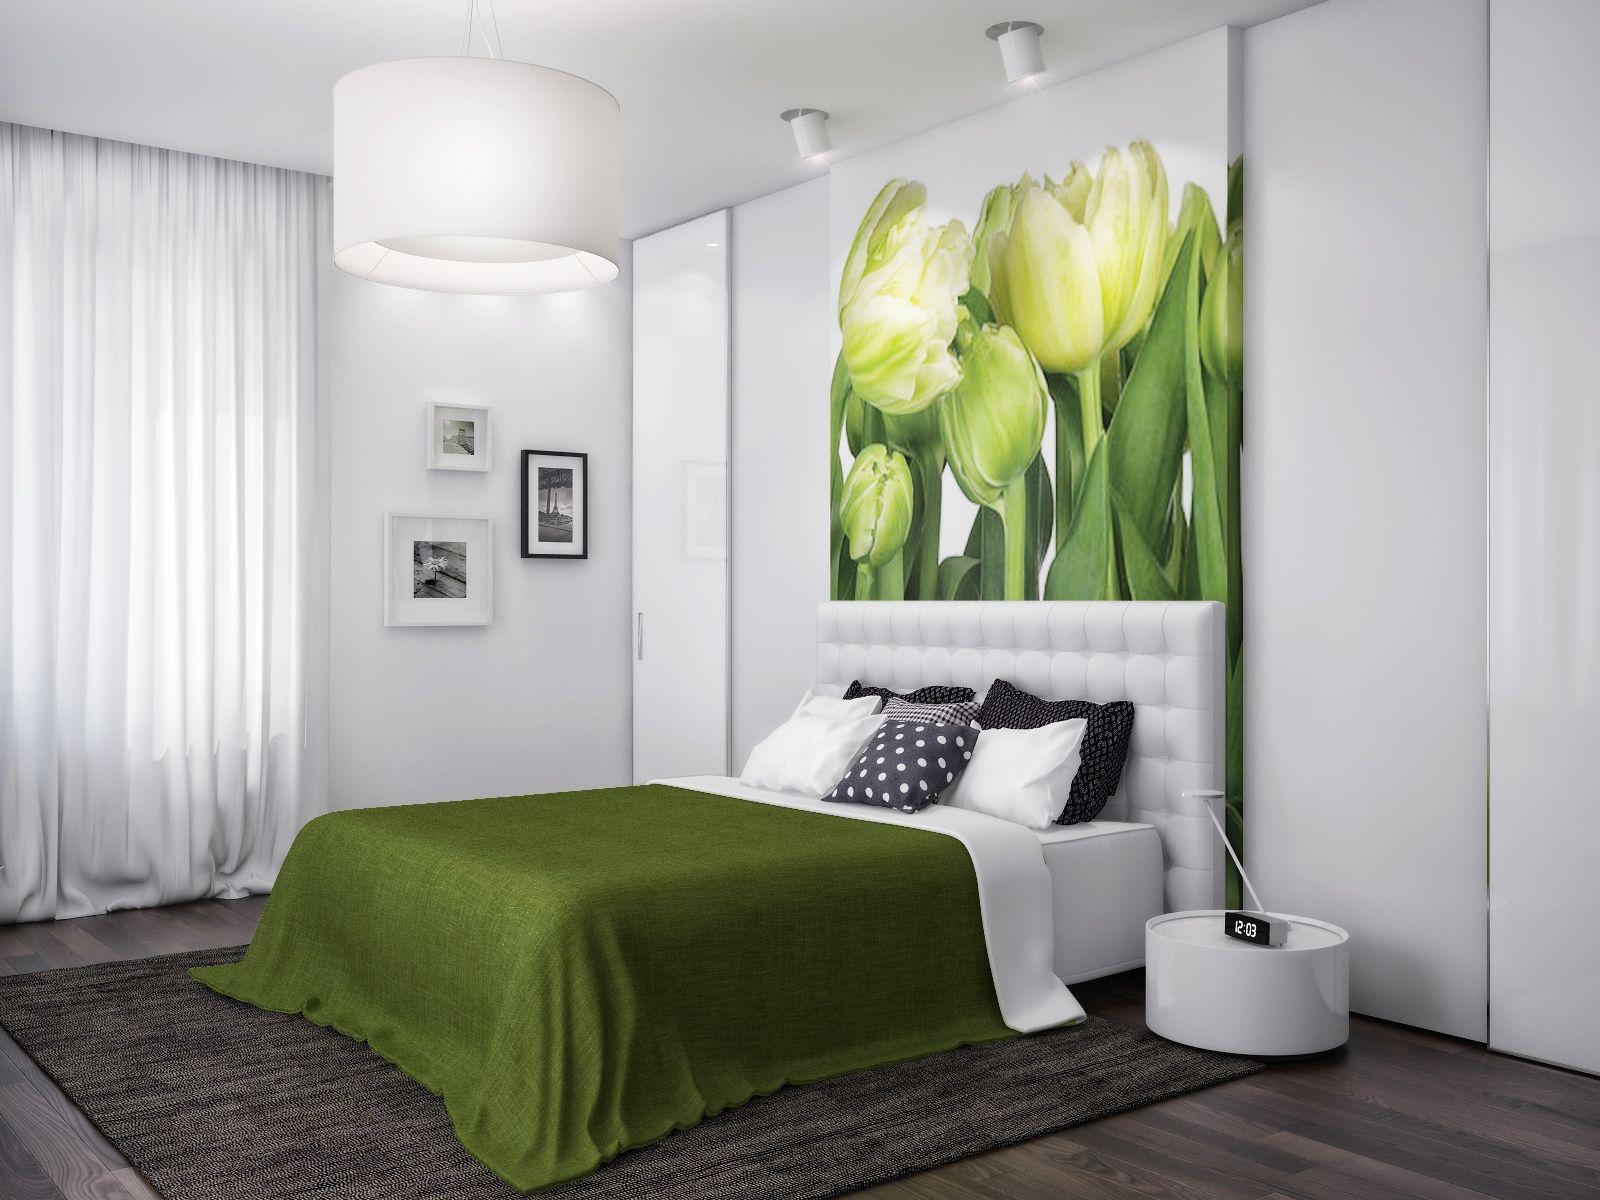 Modern Zoning In Ukrainian Apartment Green White Nature Bedroom Interior Design Ideas Green White Bedroom Bedroom Green Diy Bedroom Decor